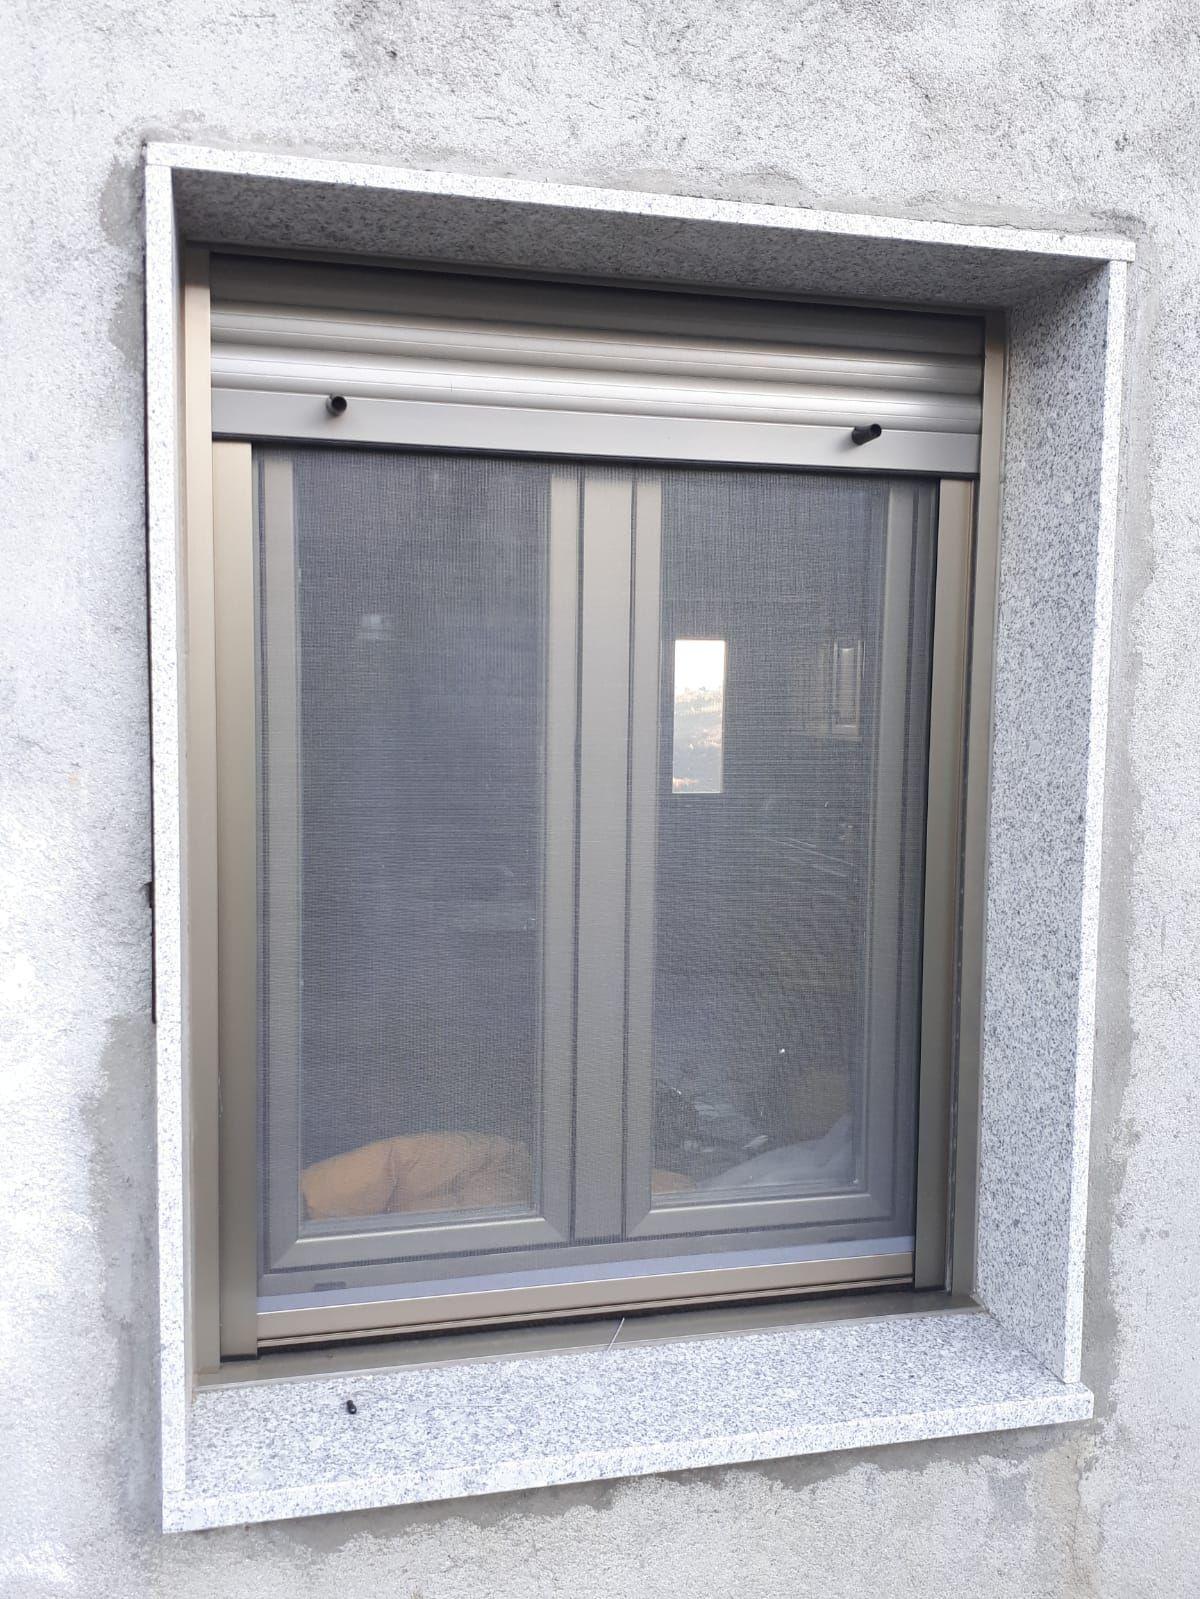 Venta de ventanas de aluminio en Riós